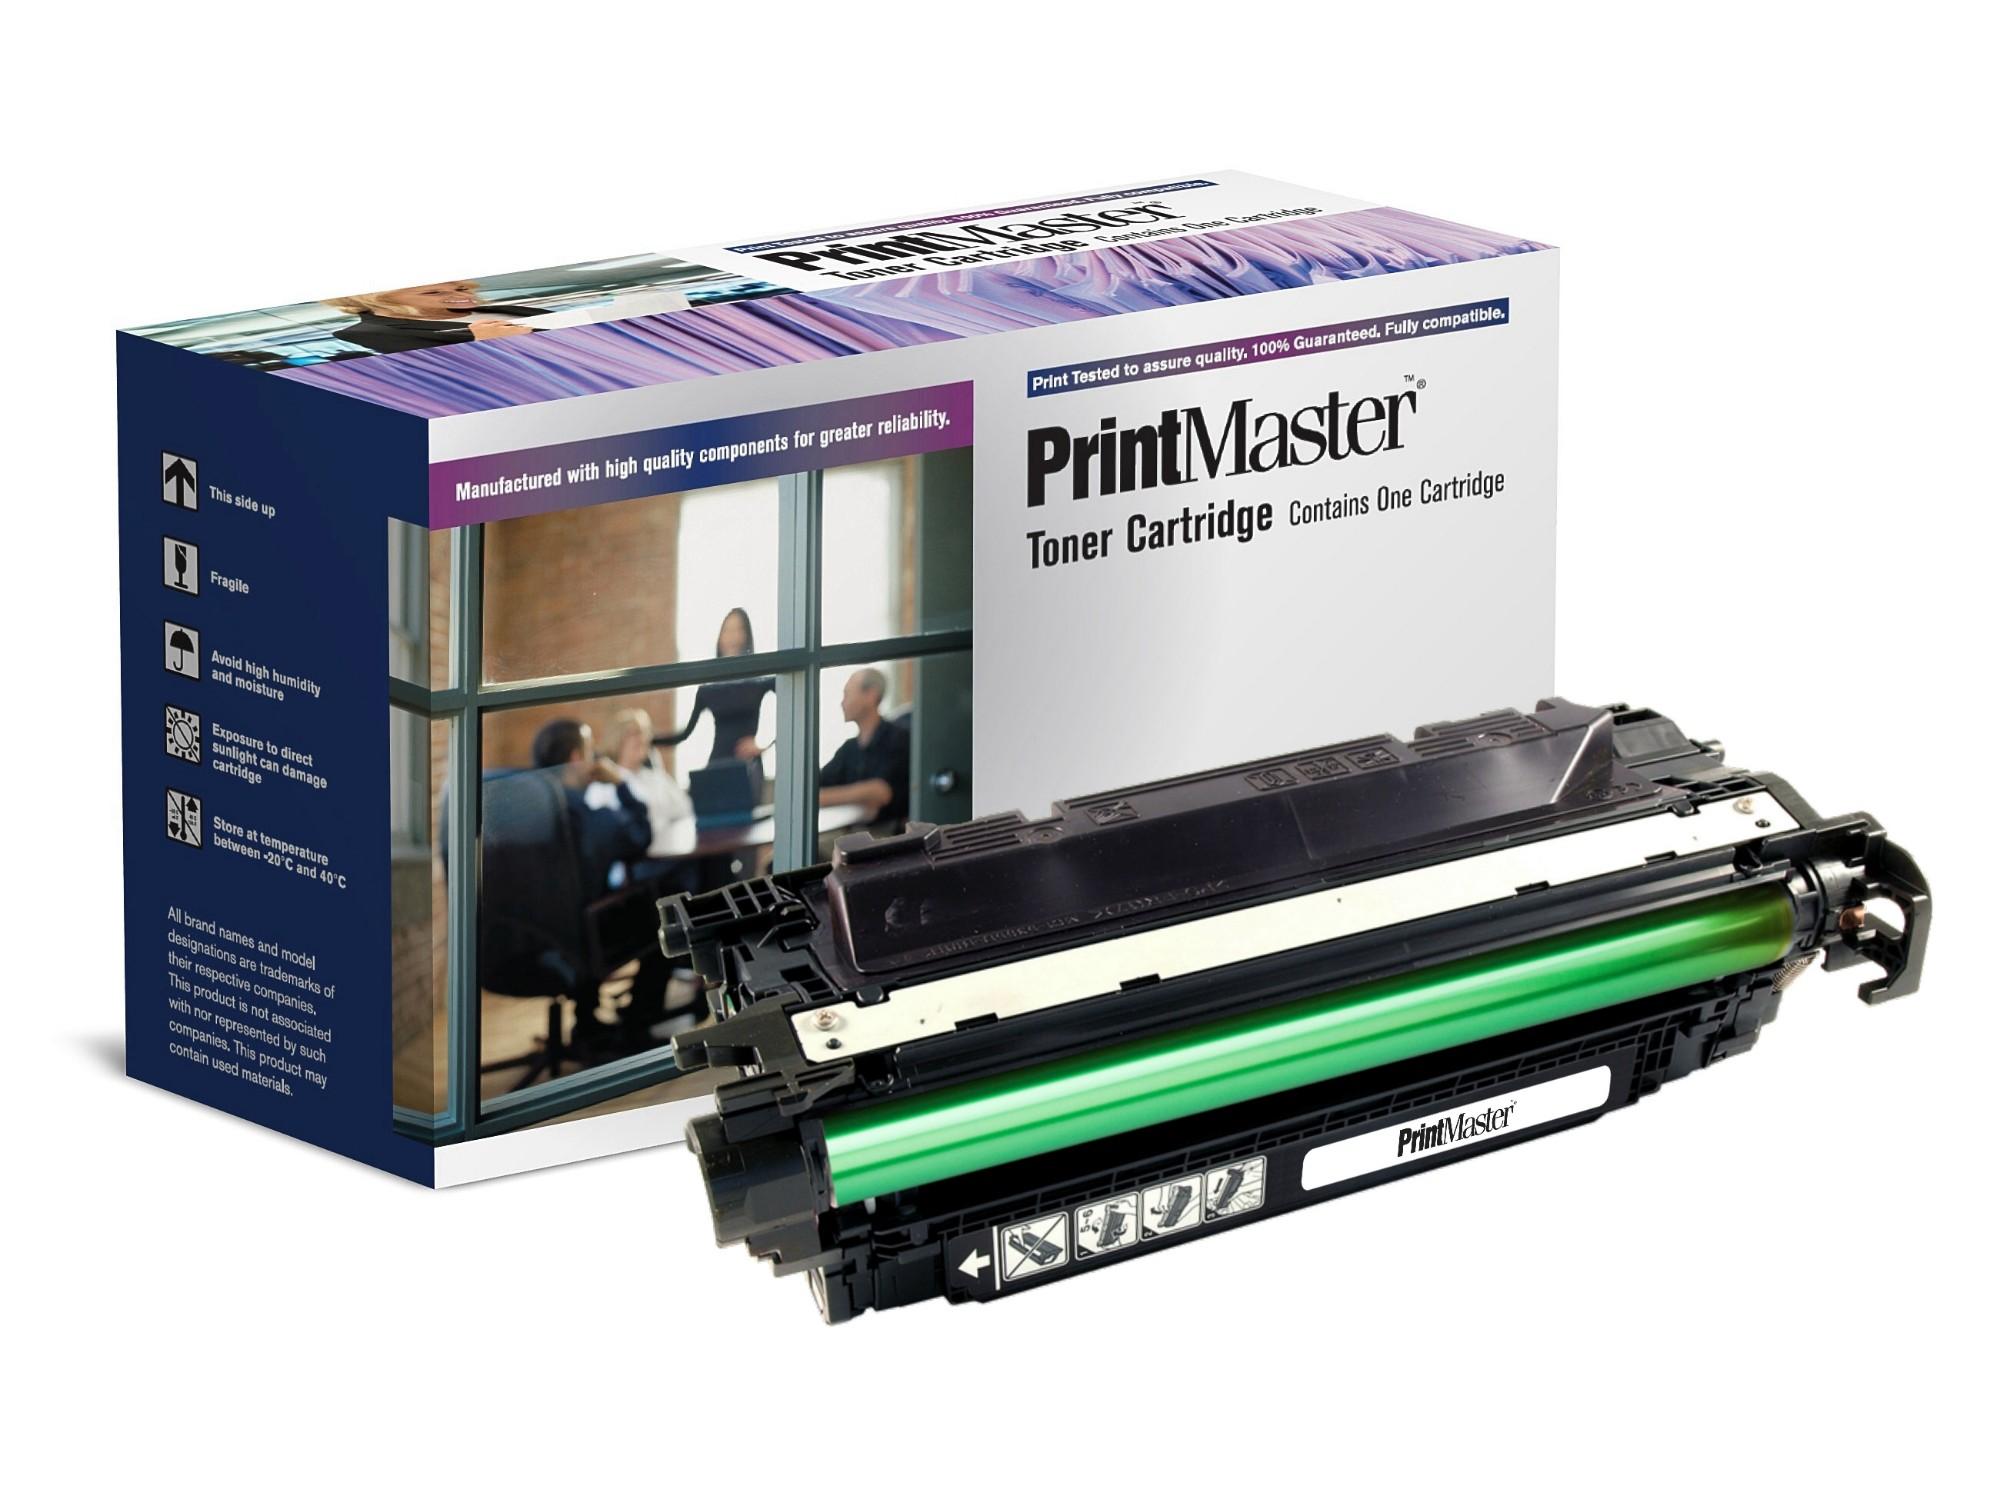 PrintMaster Black Toner Cartridge for HP Color LaserJet CP 4525A